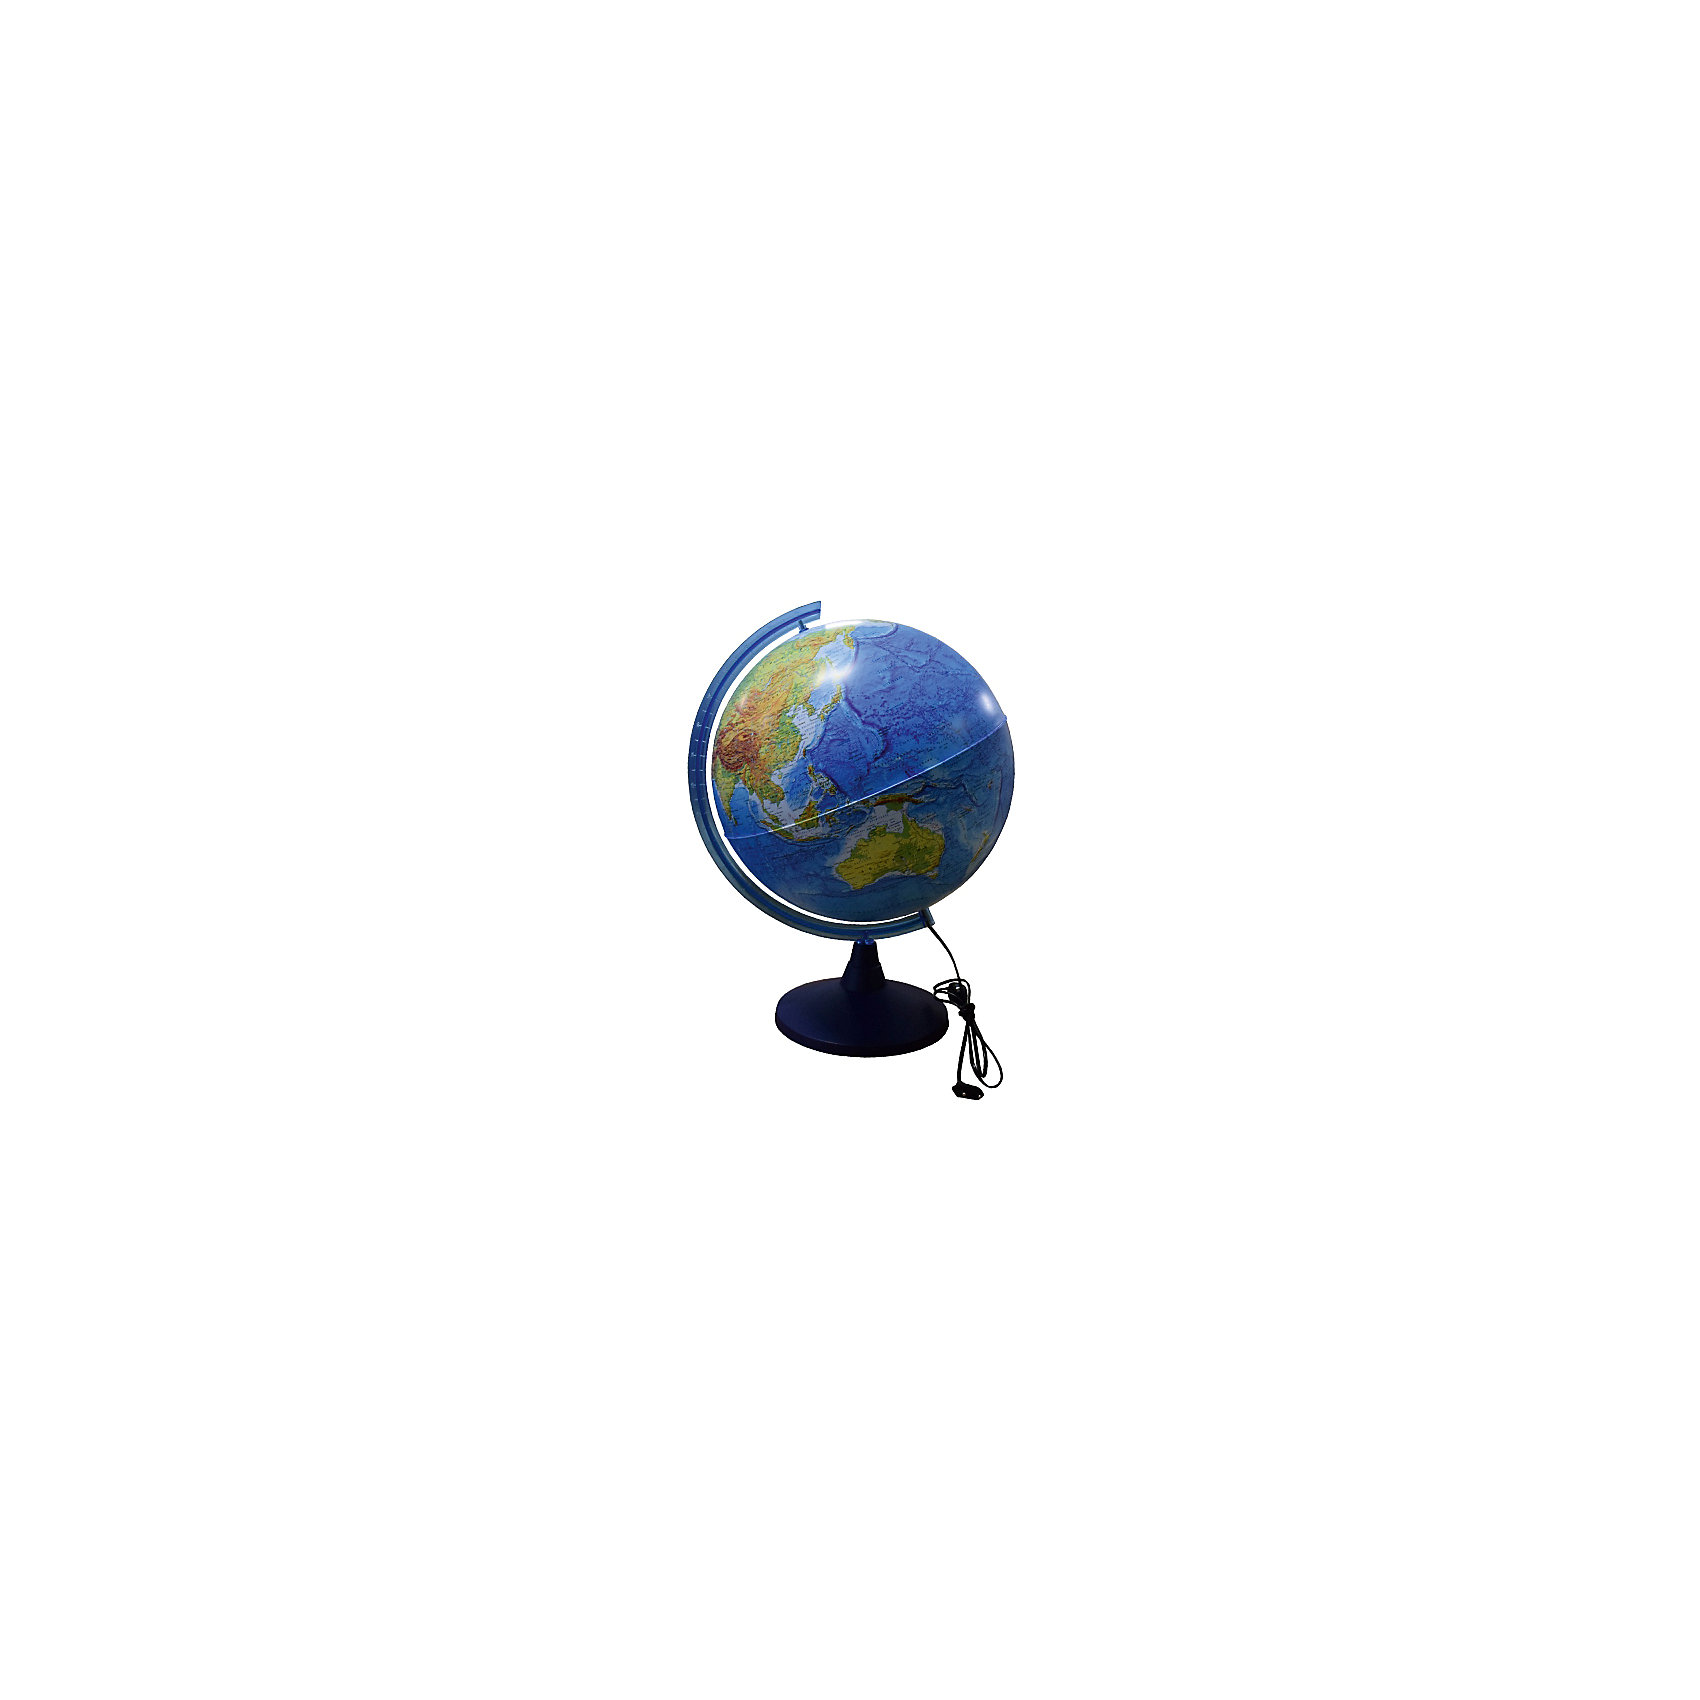 Глобус Земли физический с подсветкой, диаметр 400 ммГлобус Земли д-р 400 физический с подсветкой<br><br>Ширина мм: 420<br>Глубина мм: 400<br>Высота мм: 400<br>Вес г: 500<br>Возраст от месяцев: 72<br>Возраст до месяцев: 2147483647<br>Пол: Унисекс<br>Возраст: Детский<br>SKU: 5504479